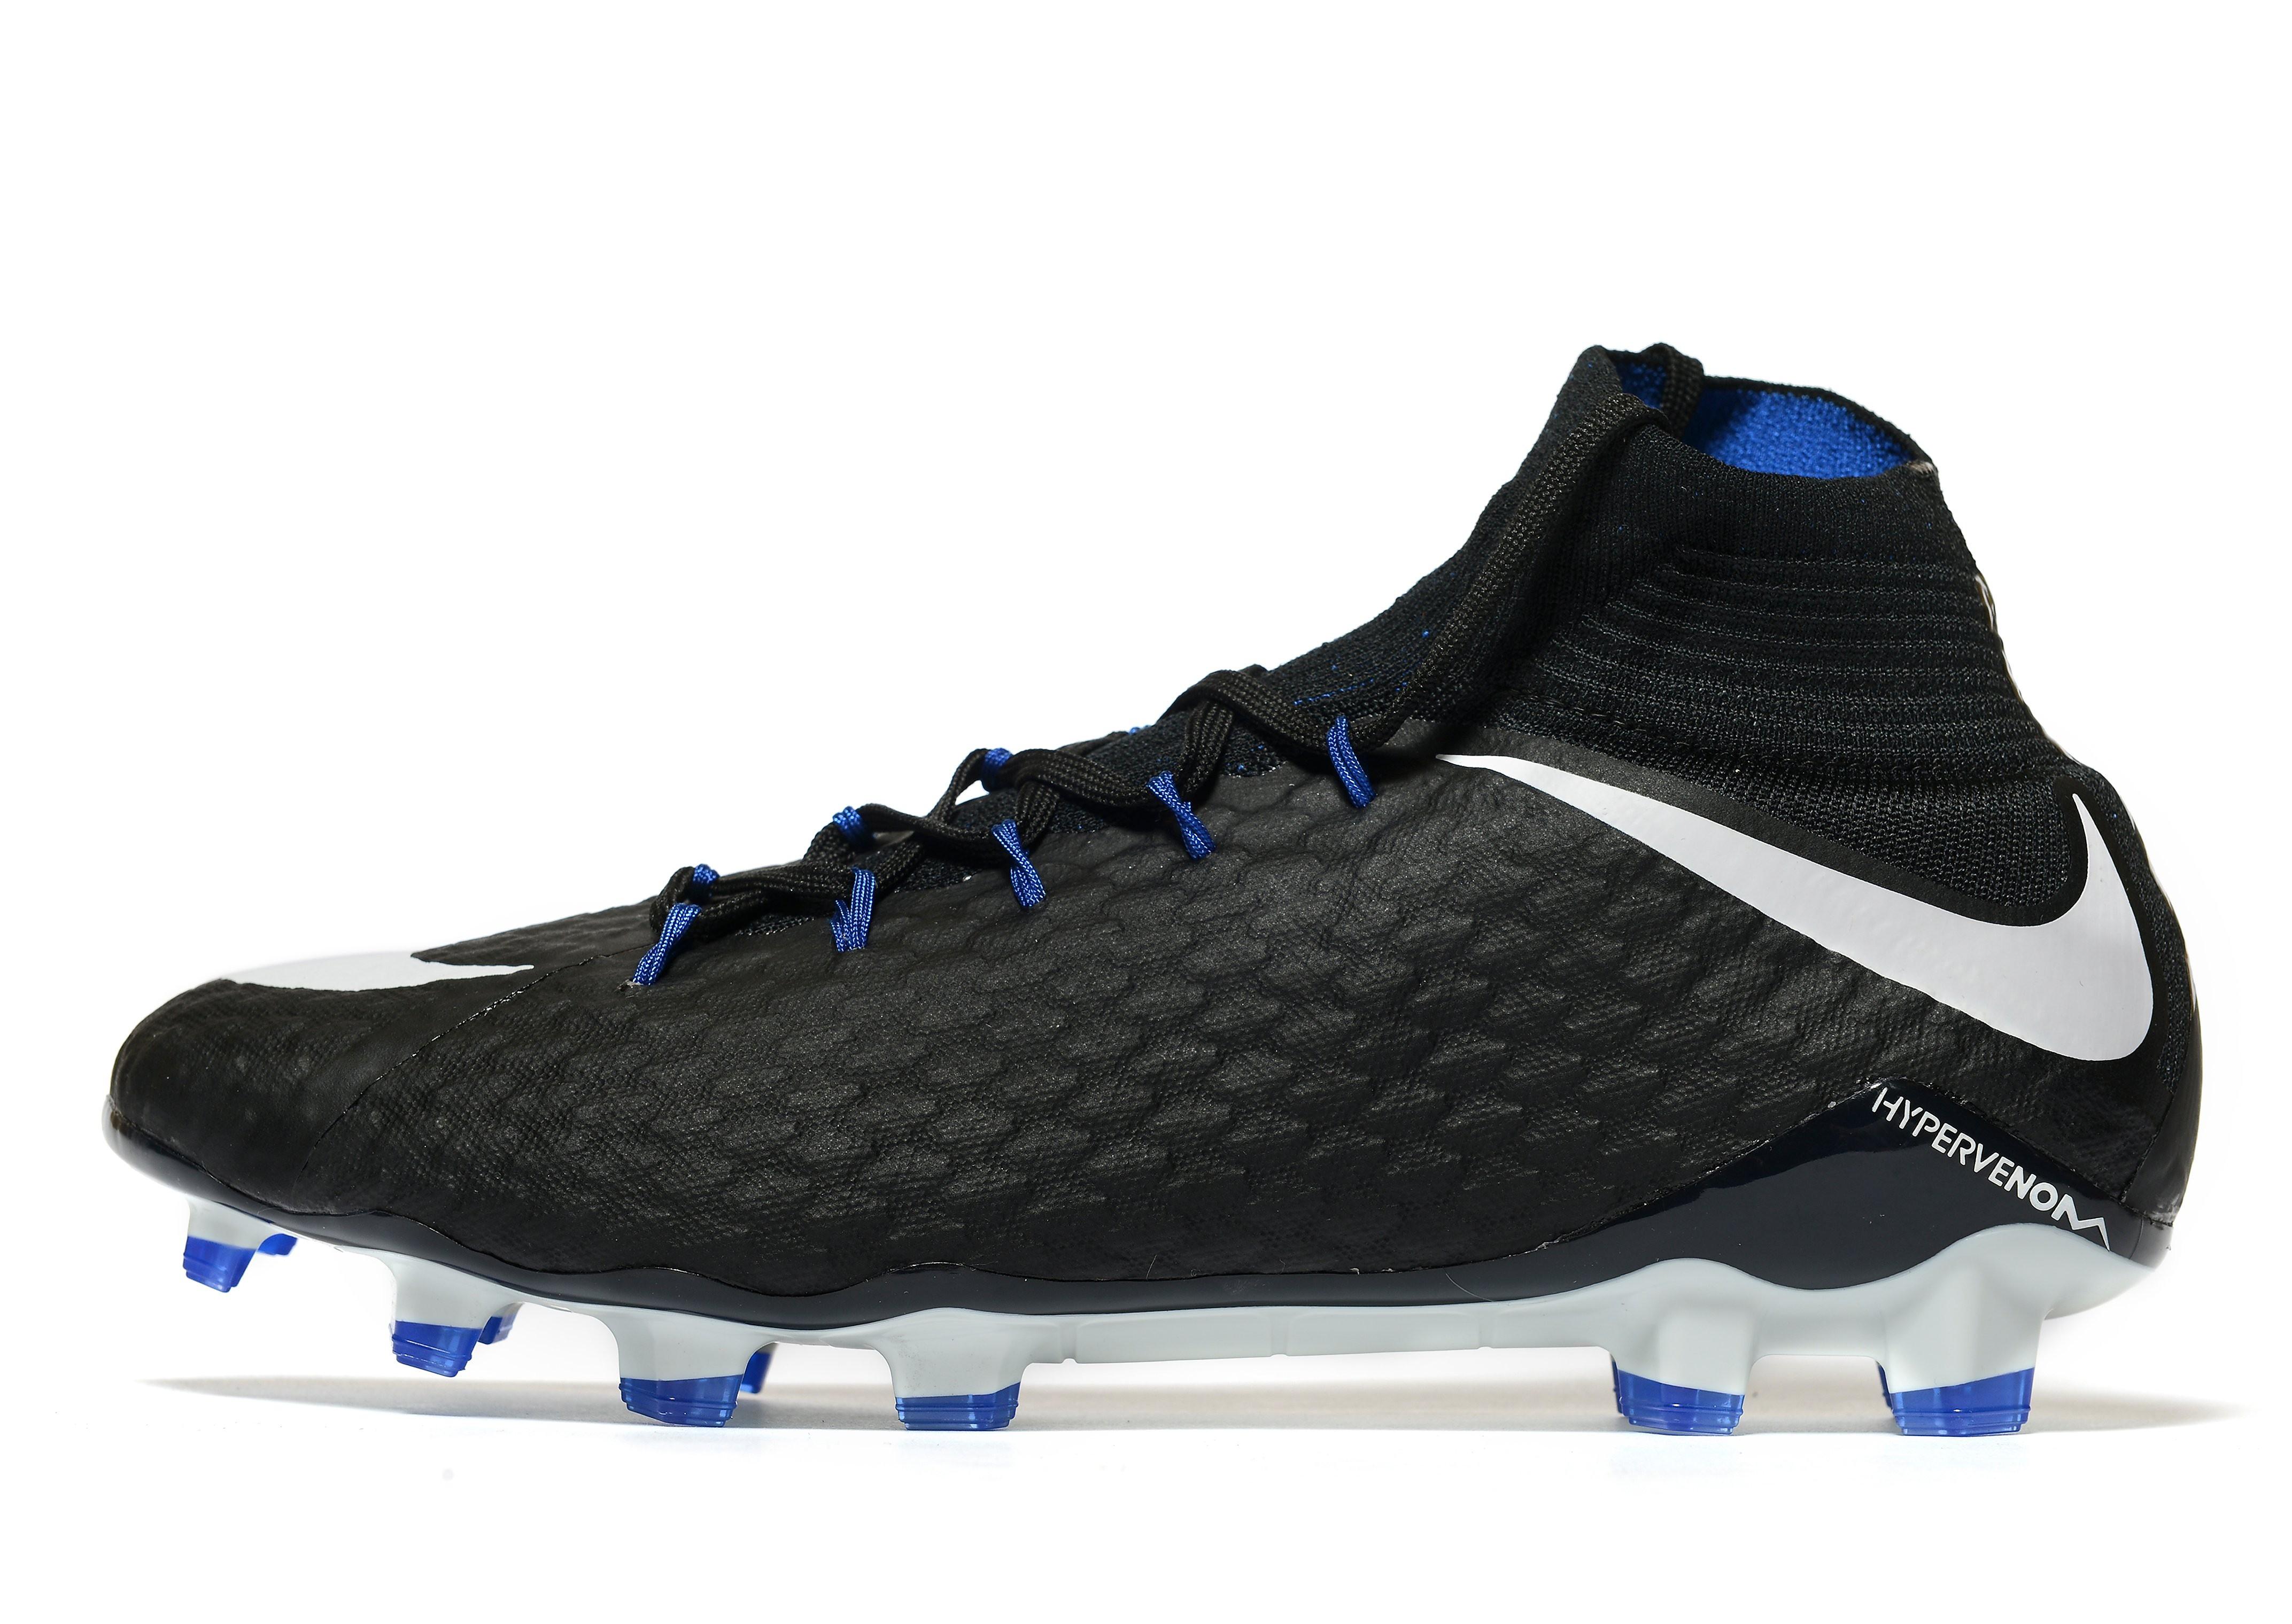 Nike Dark Lightning Hypervenom Phatal II FG